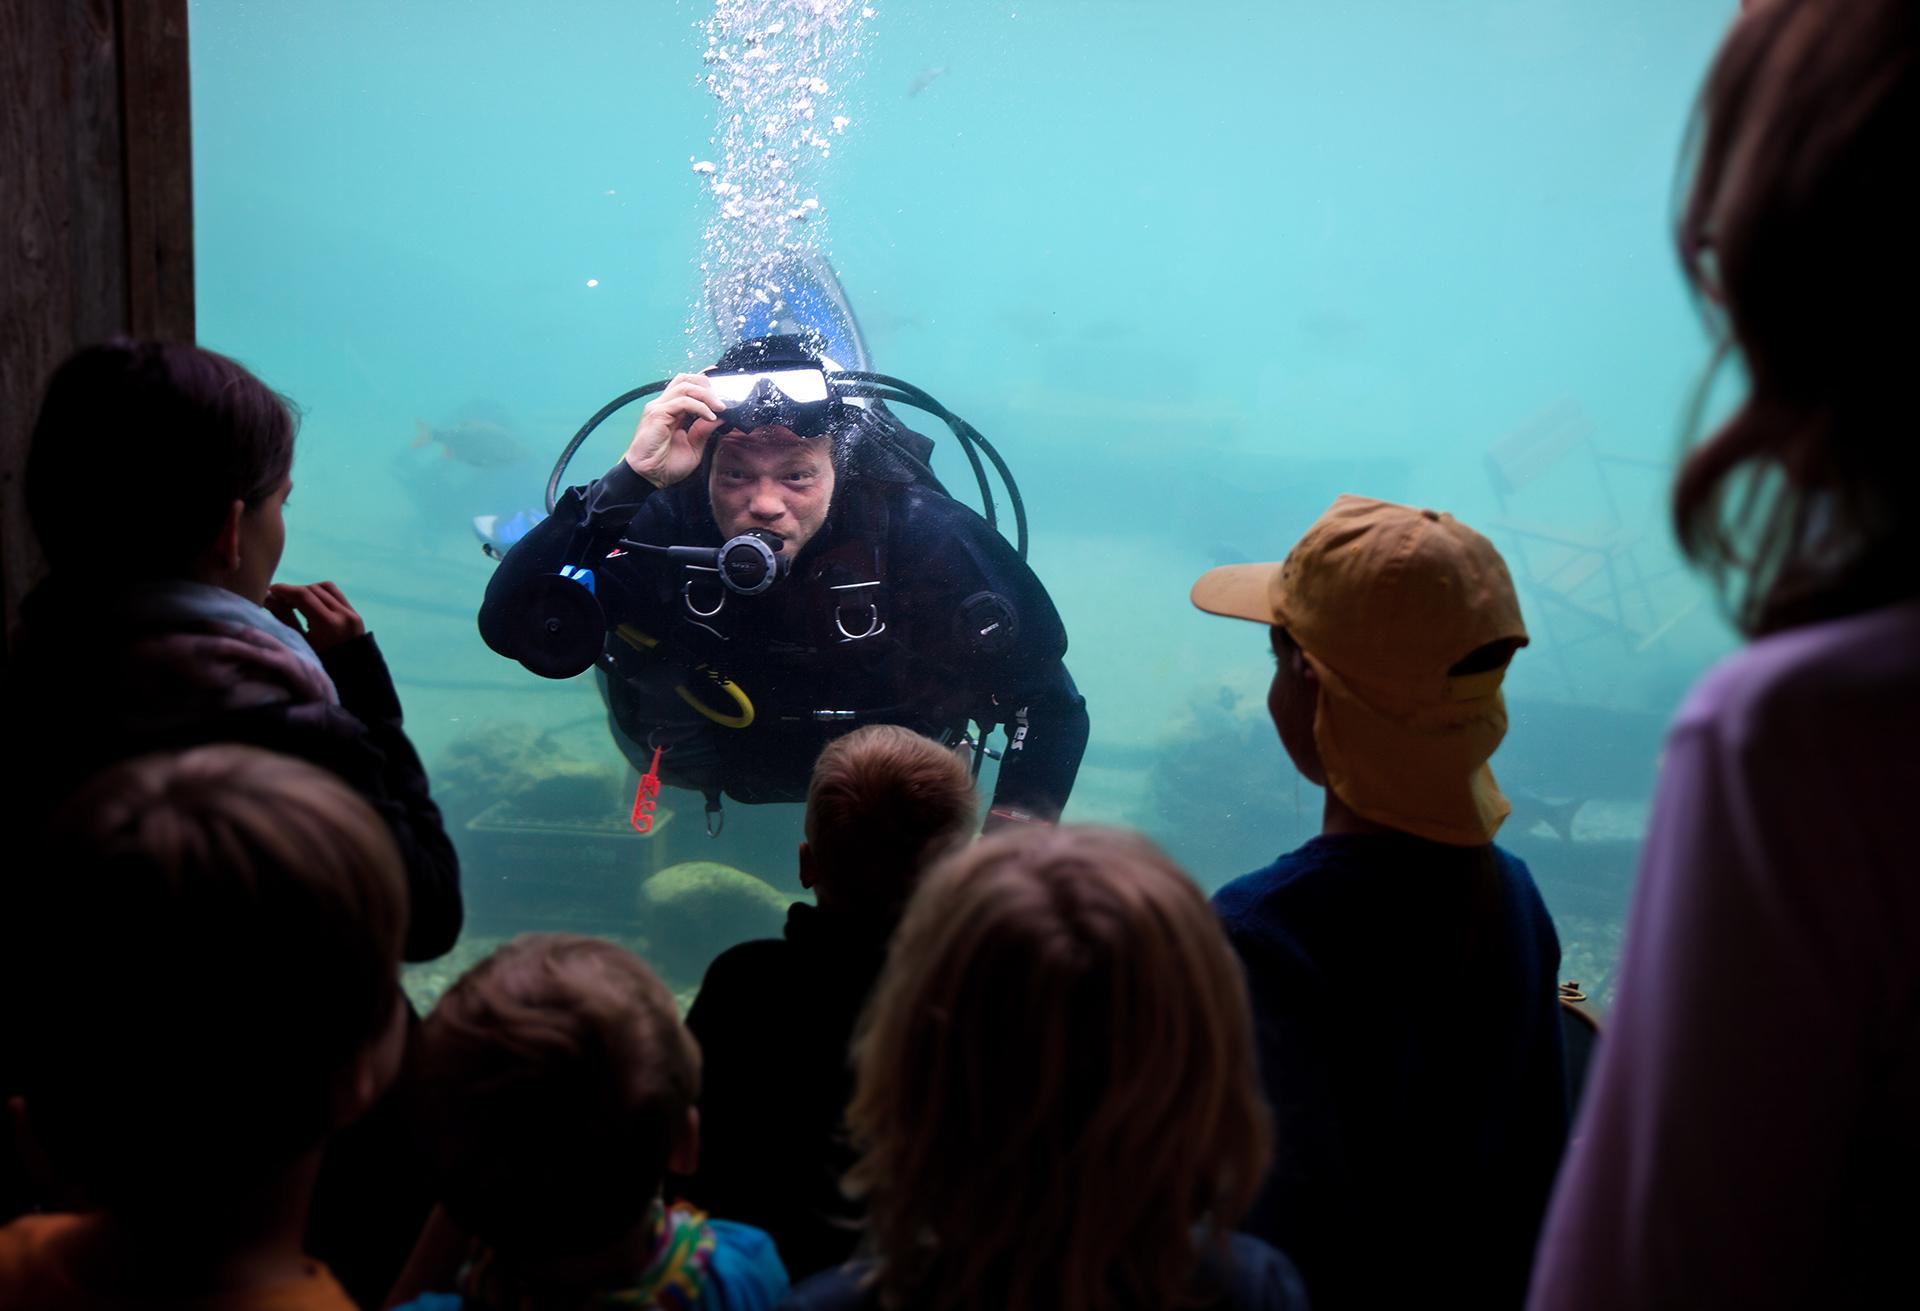 Taucher im Erlebnis-Aquarium Rövershagen